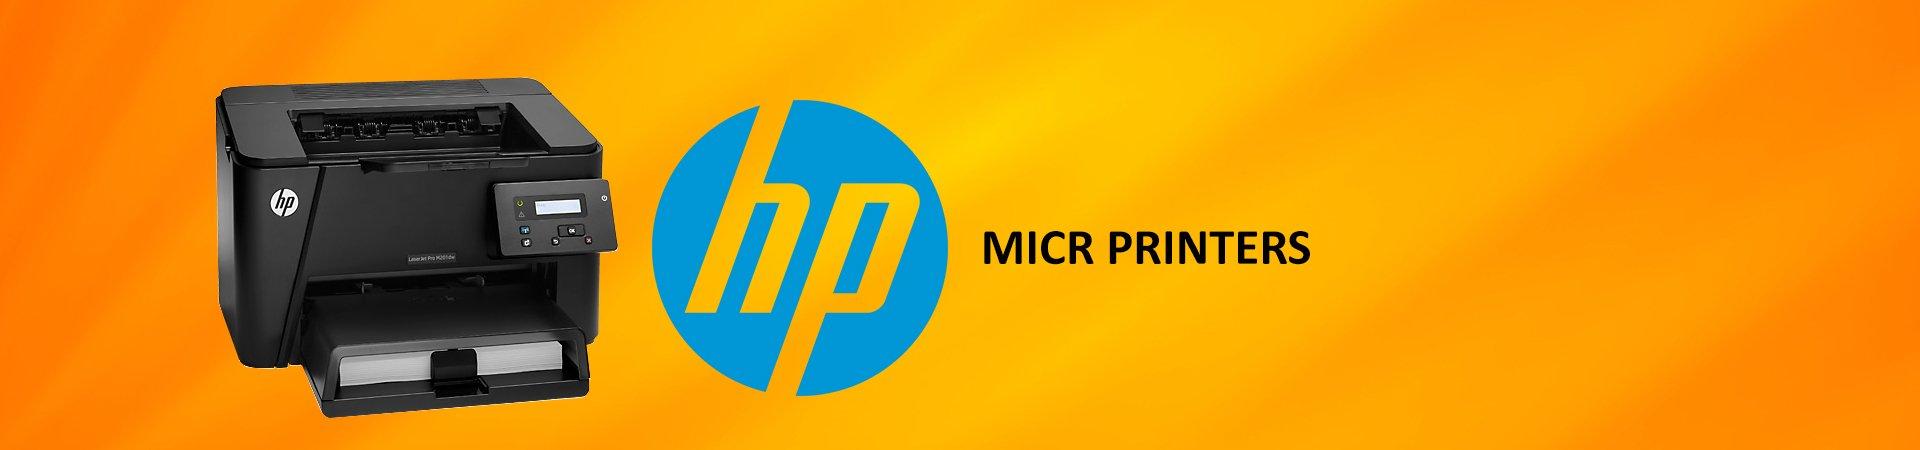 Printerm Datascribe Inc. HP MICR Printers